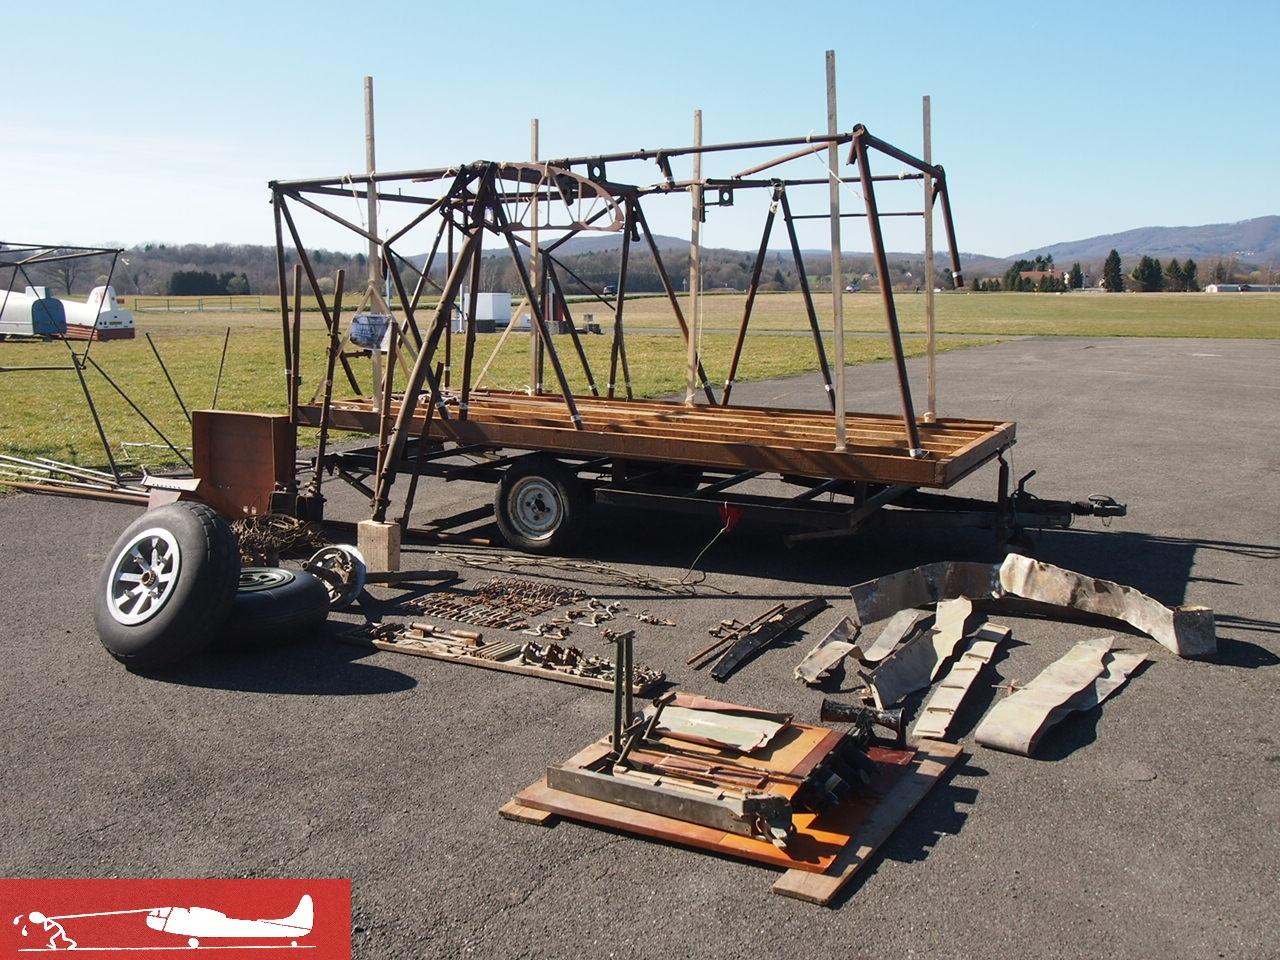 [Gliderborne] Restauration planeur WACO CG-4A P4179736